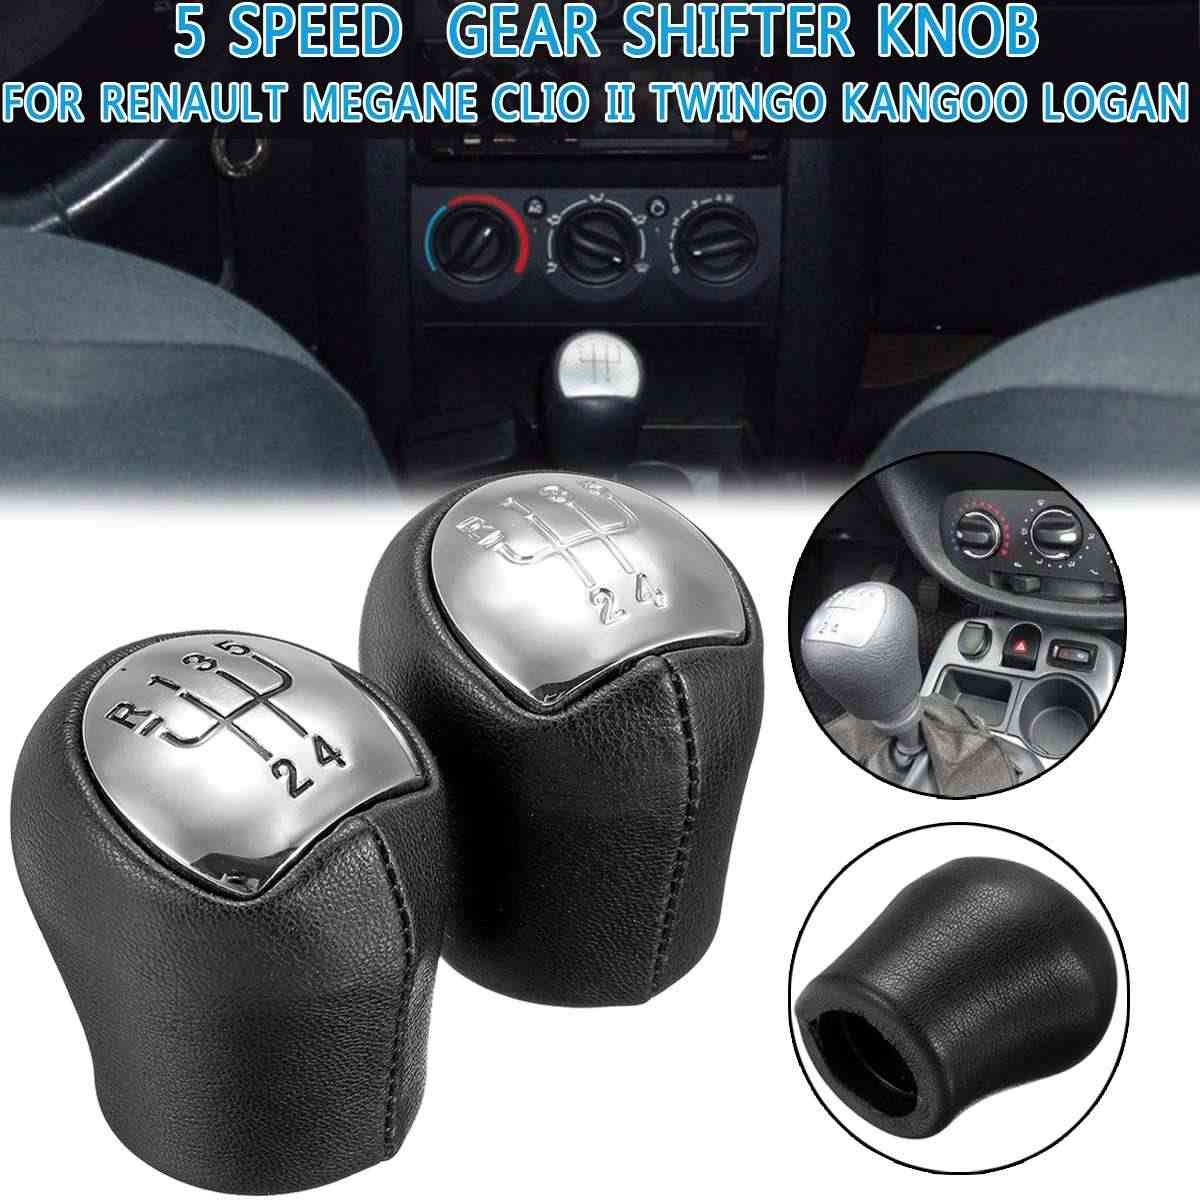 Gear Stick Shift Knob Head Car 5 Speed Gear Shift Lever Knob Head Lever Shifter